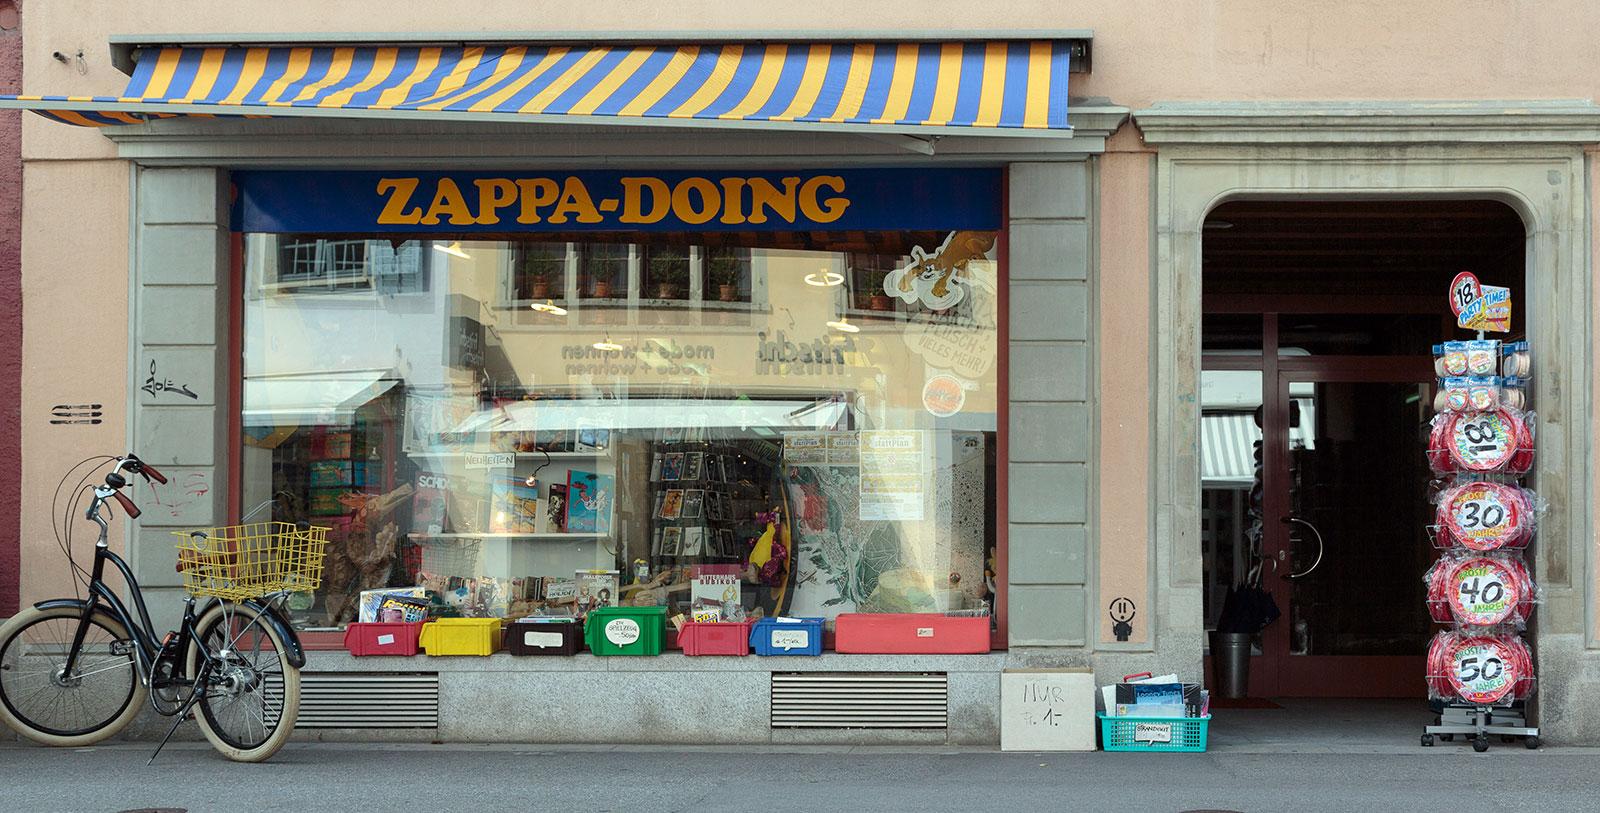 Schaufenster des Zappa-Doing Comicshop an der Obergasse 5 in Winterthur